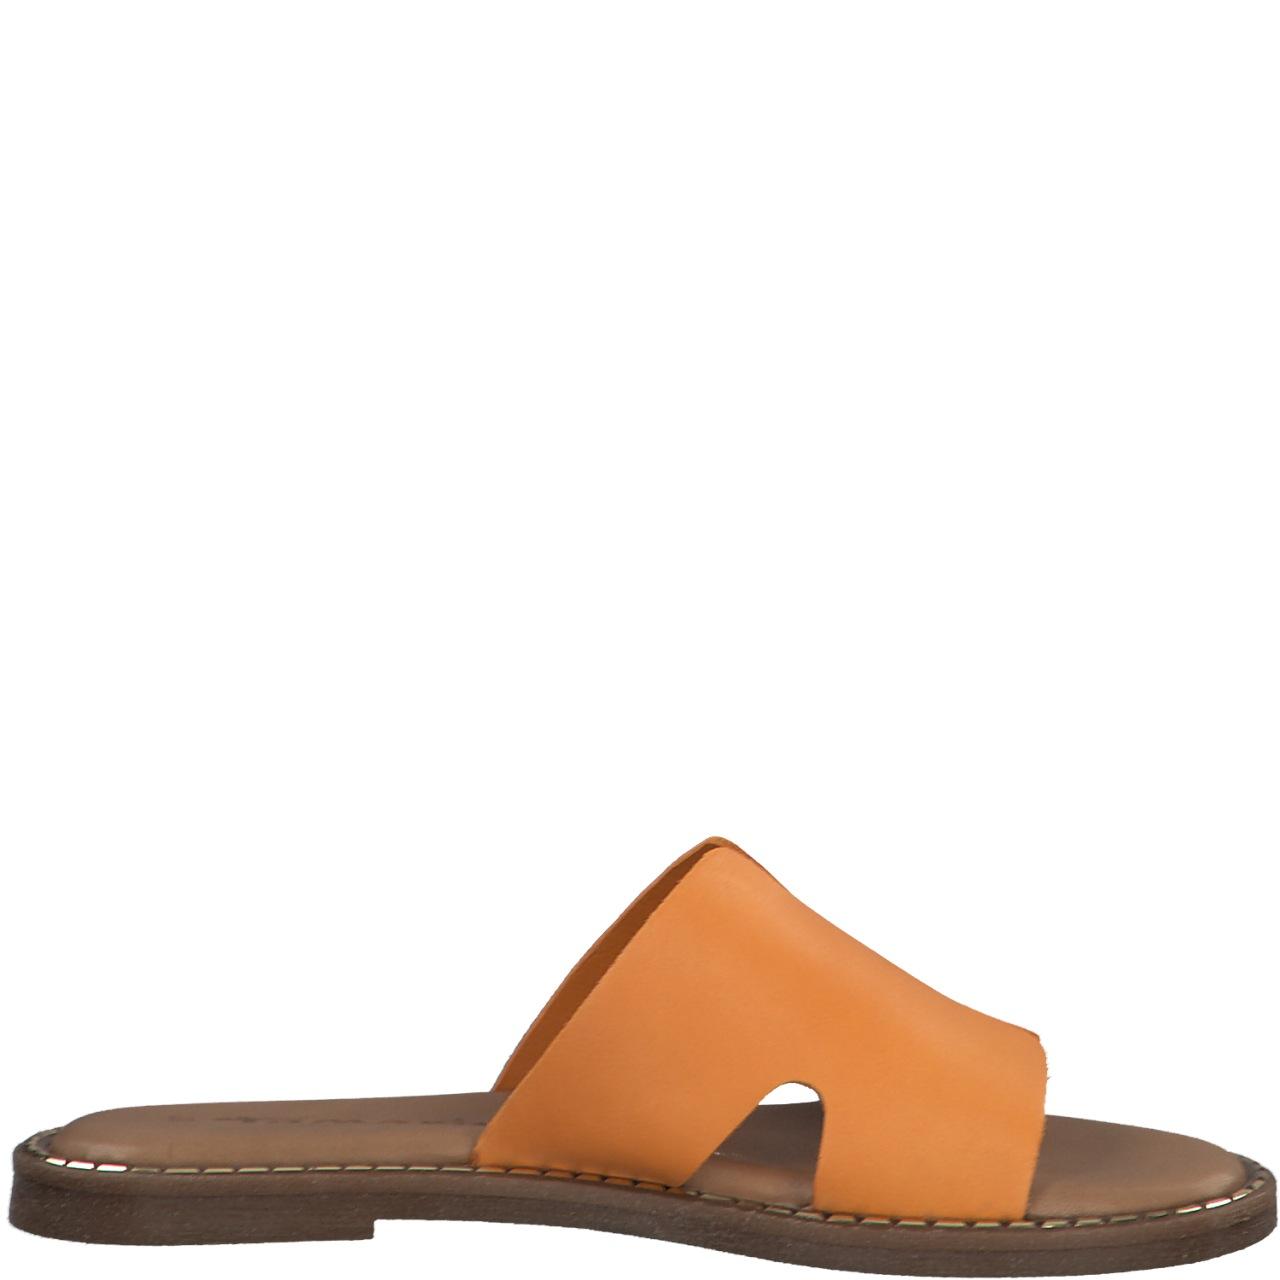 oransje sandal i skinn